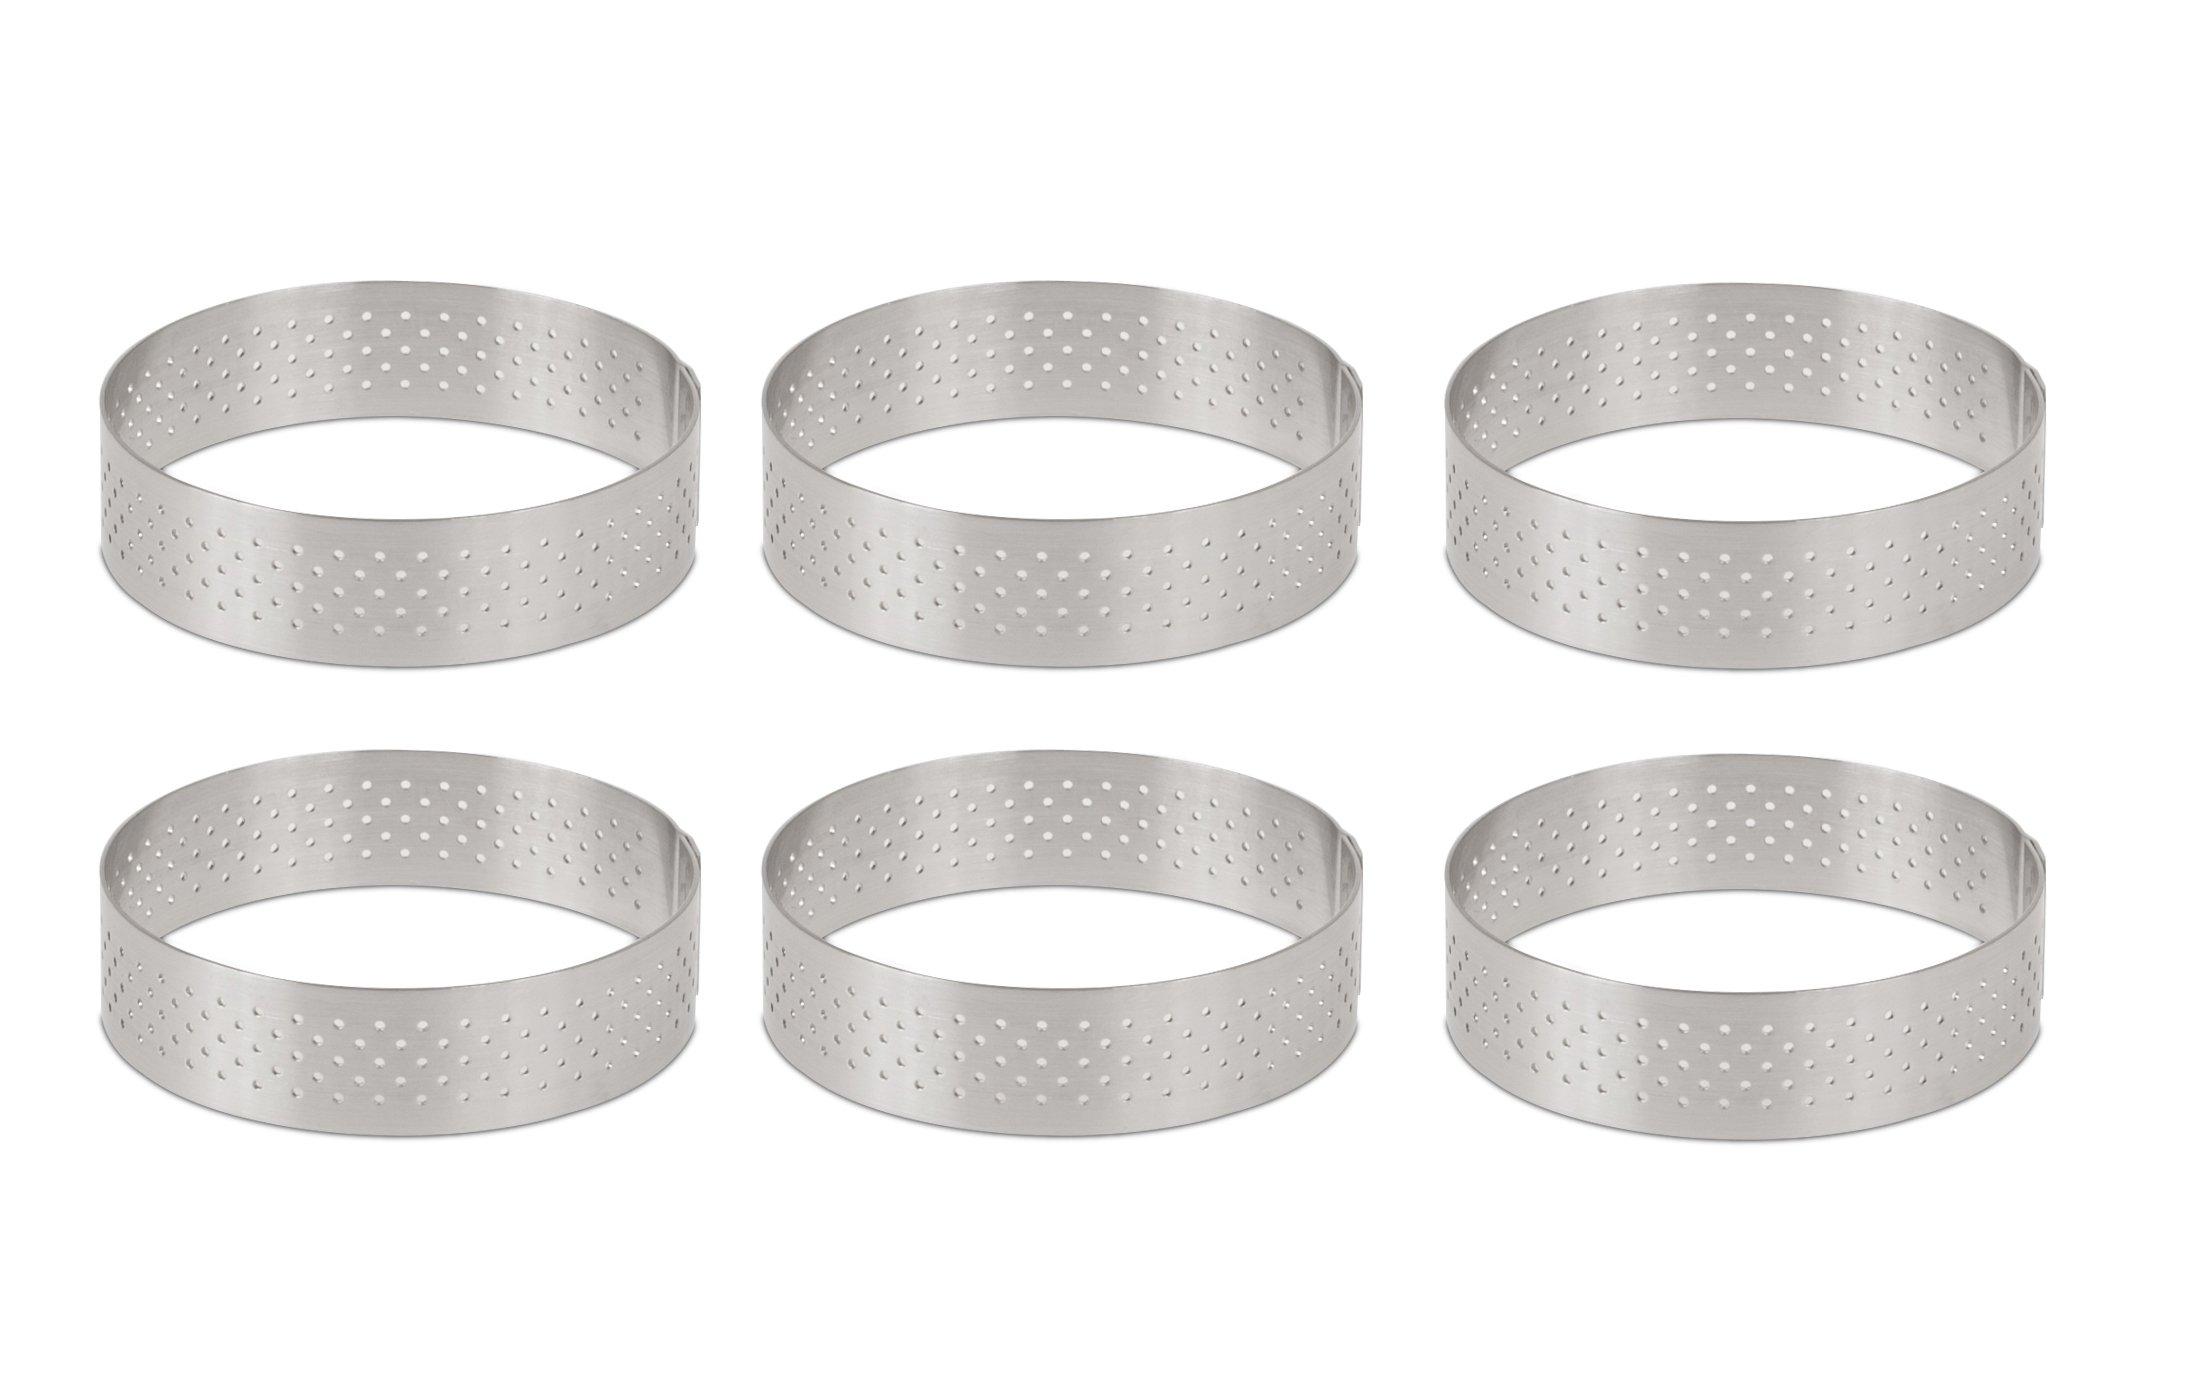 DeBuyer Valrhona Perforated Tart Ring - 3.5 inch Diameter, Set of 6 units